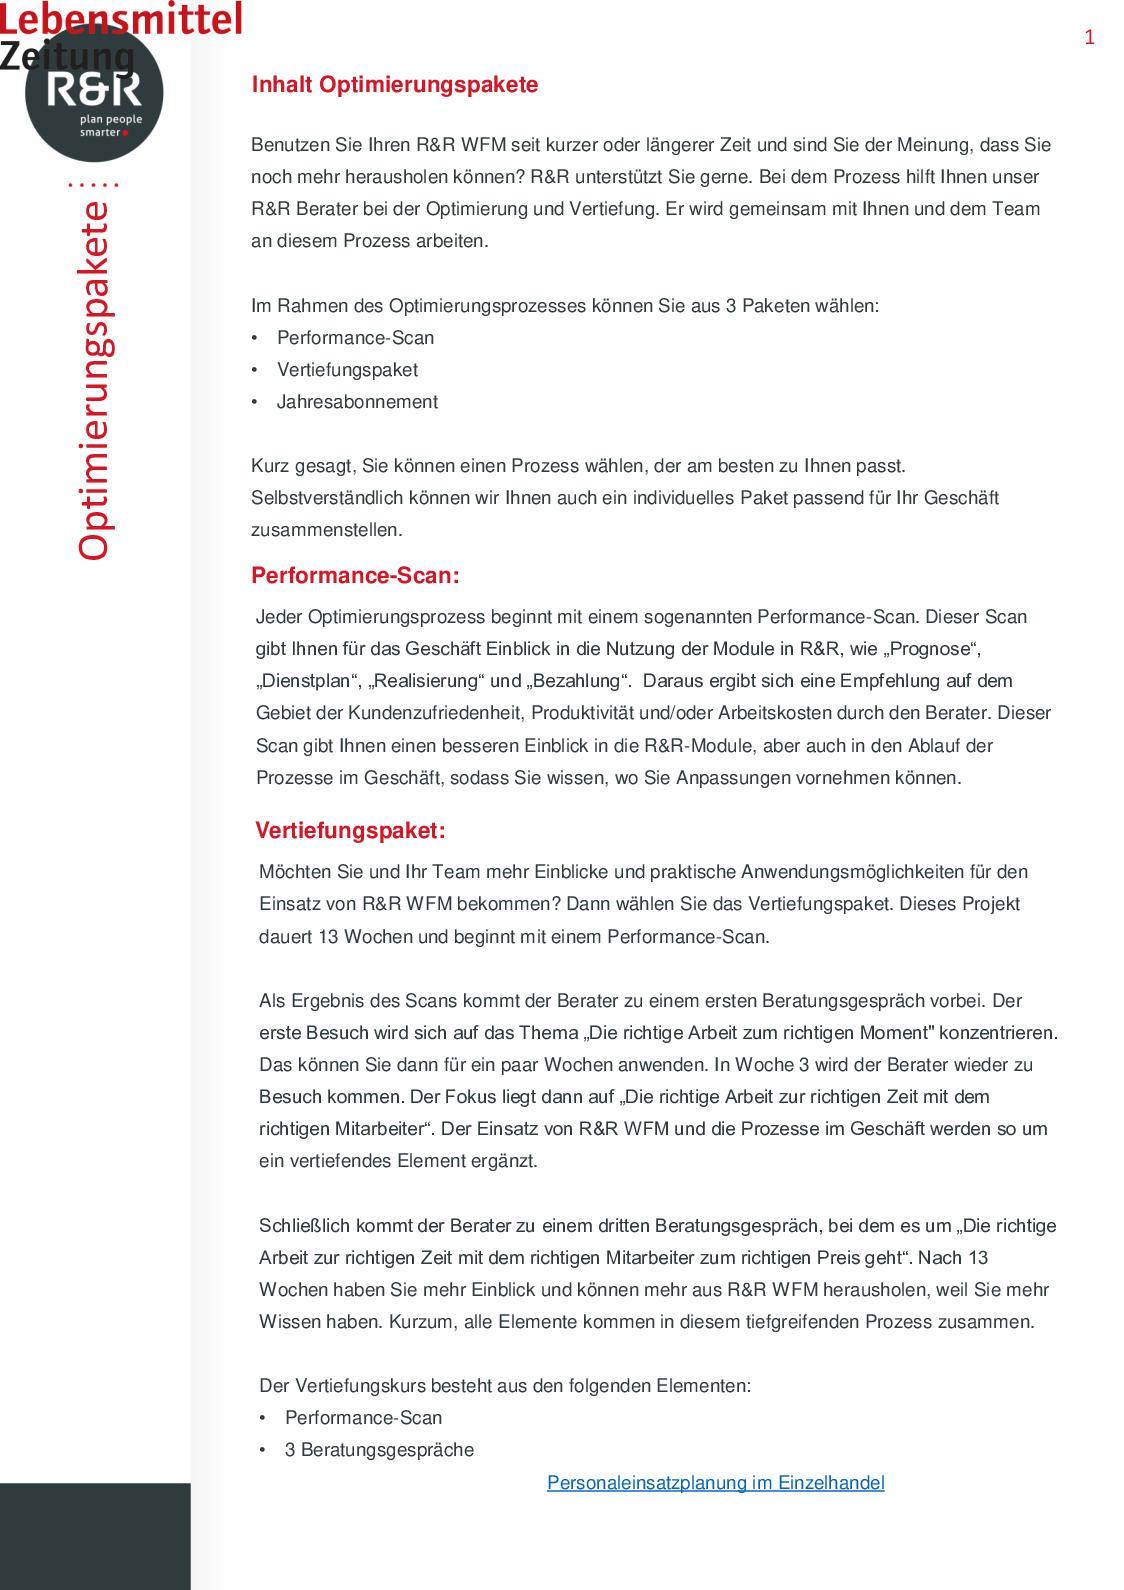 Groß Rahmen Berater Galerie - Benutzerdefinierte Bilderrahmen Ideen ...